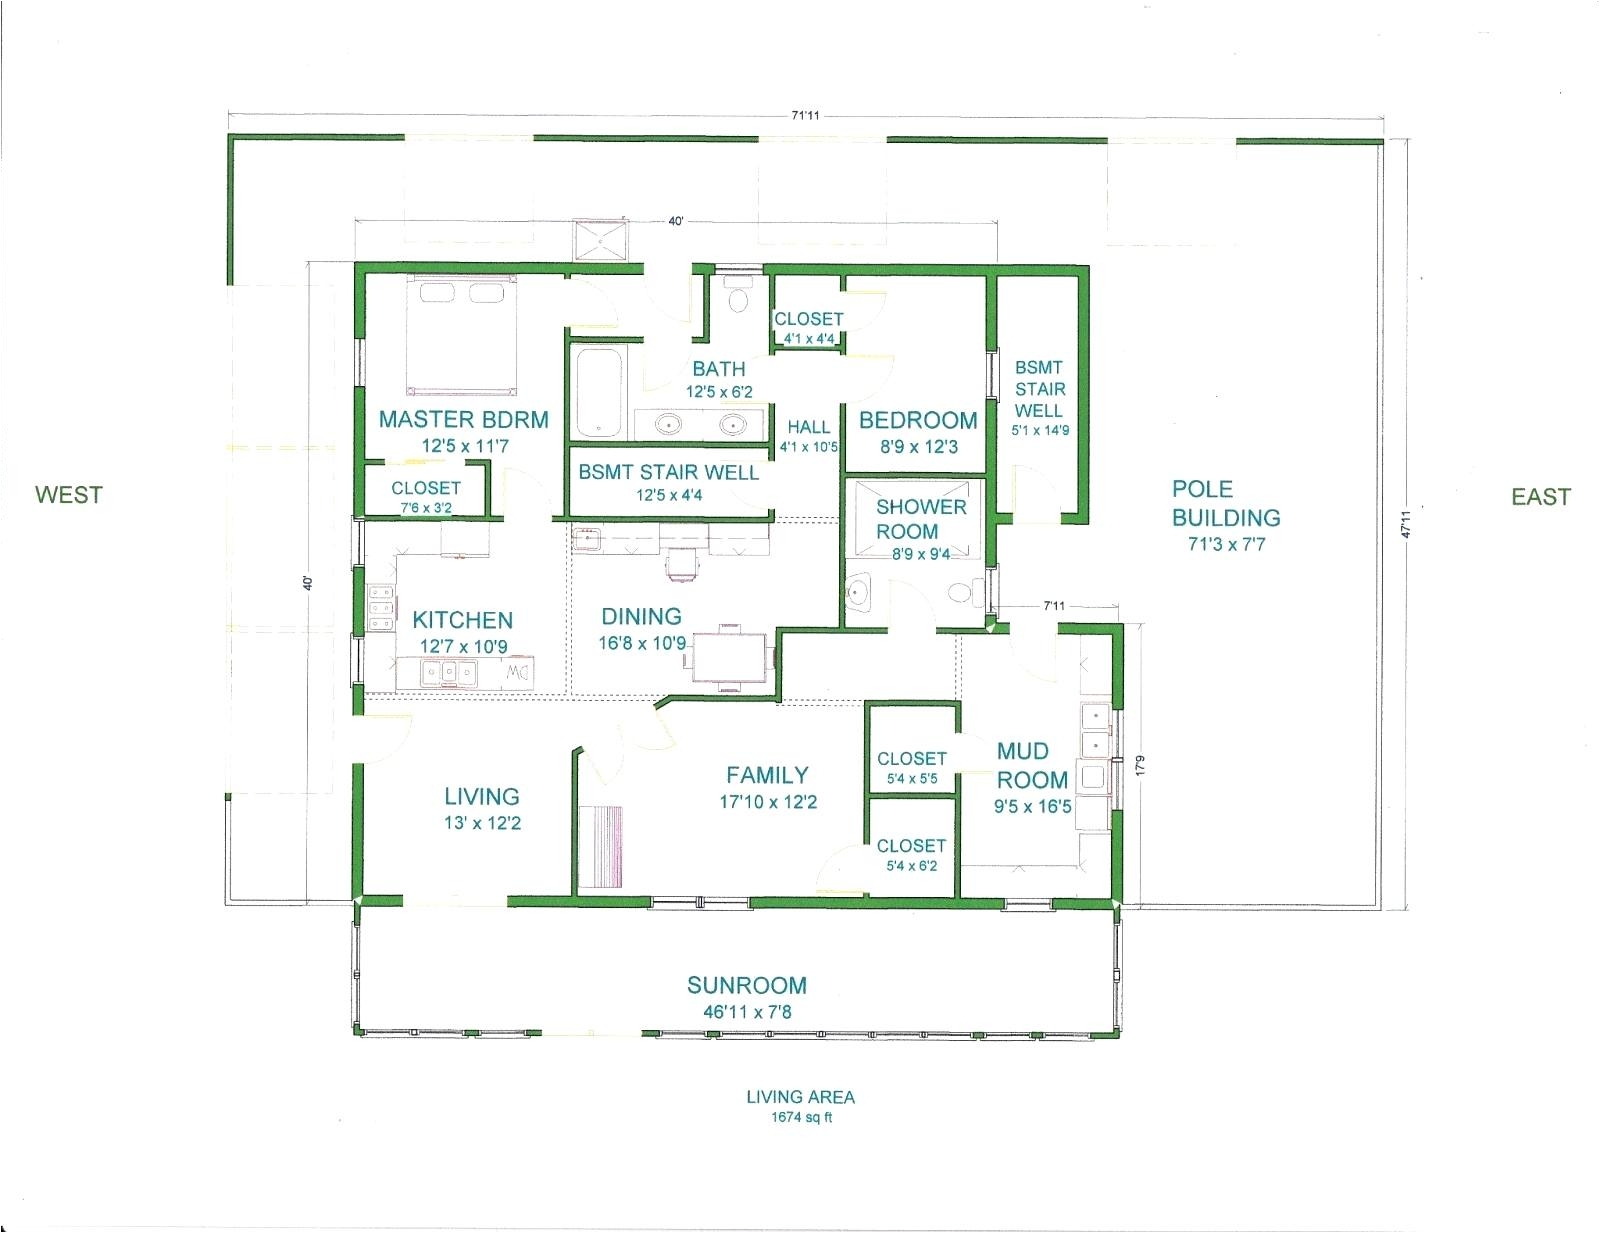 20 x 40 house plans fresh floor plan design 20 x 40 floor plans luxury design plan 0d house